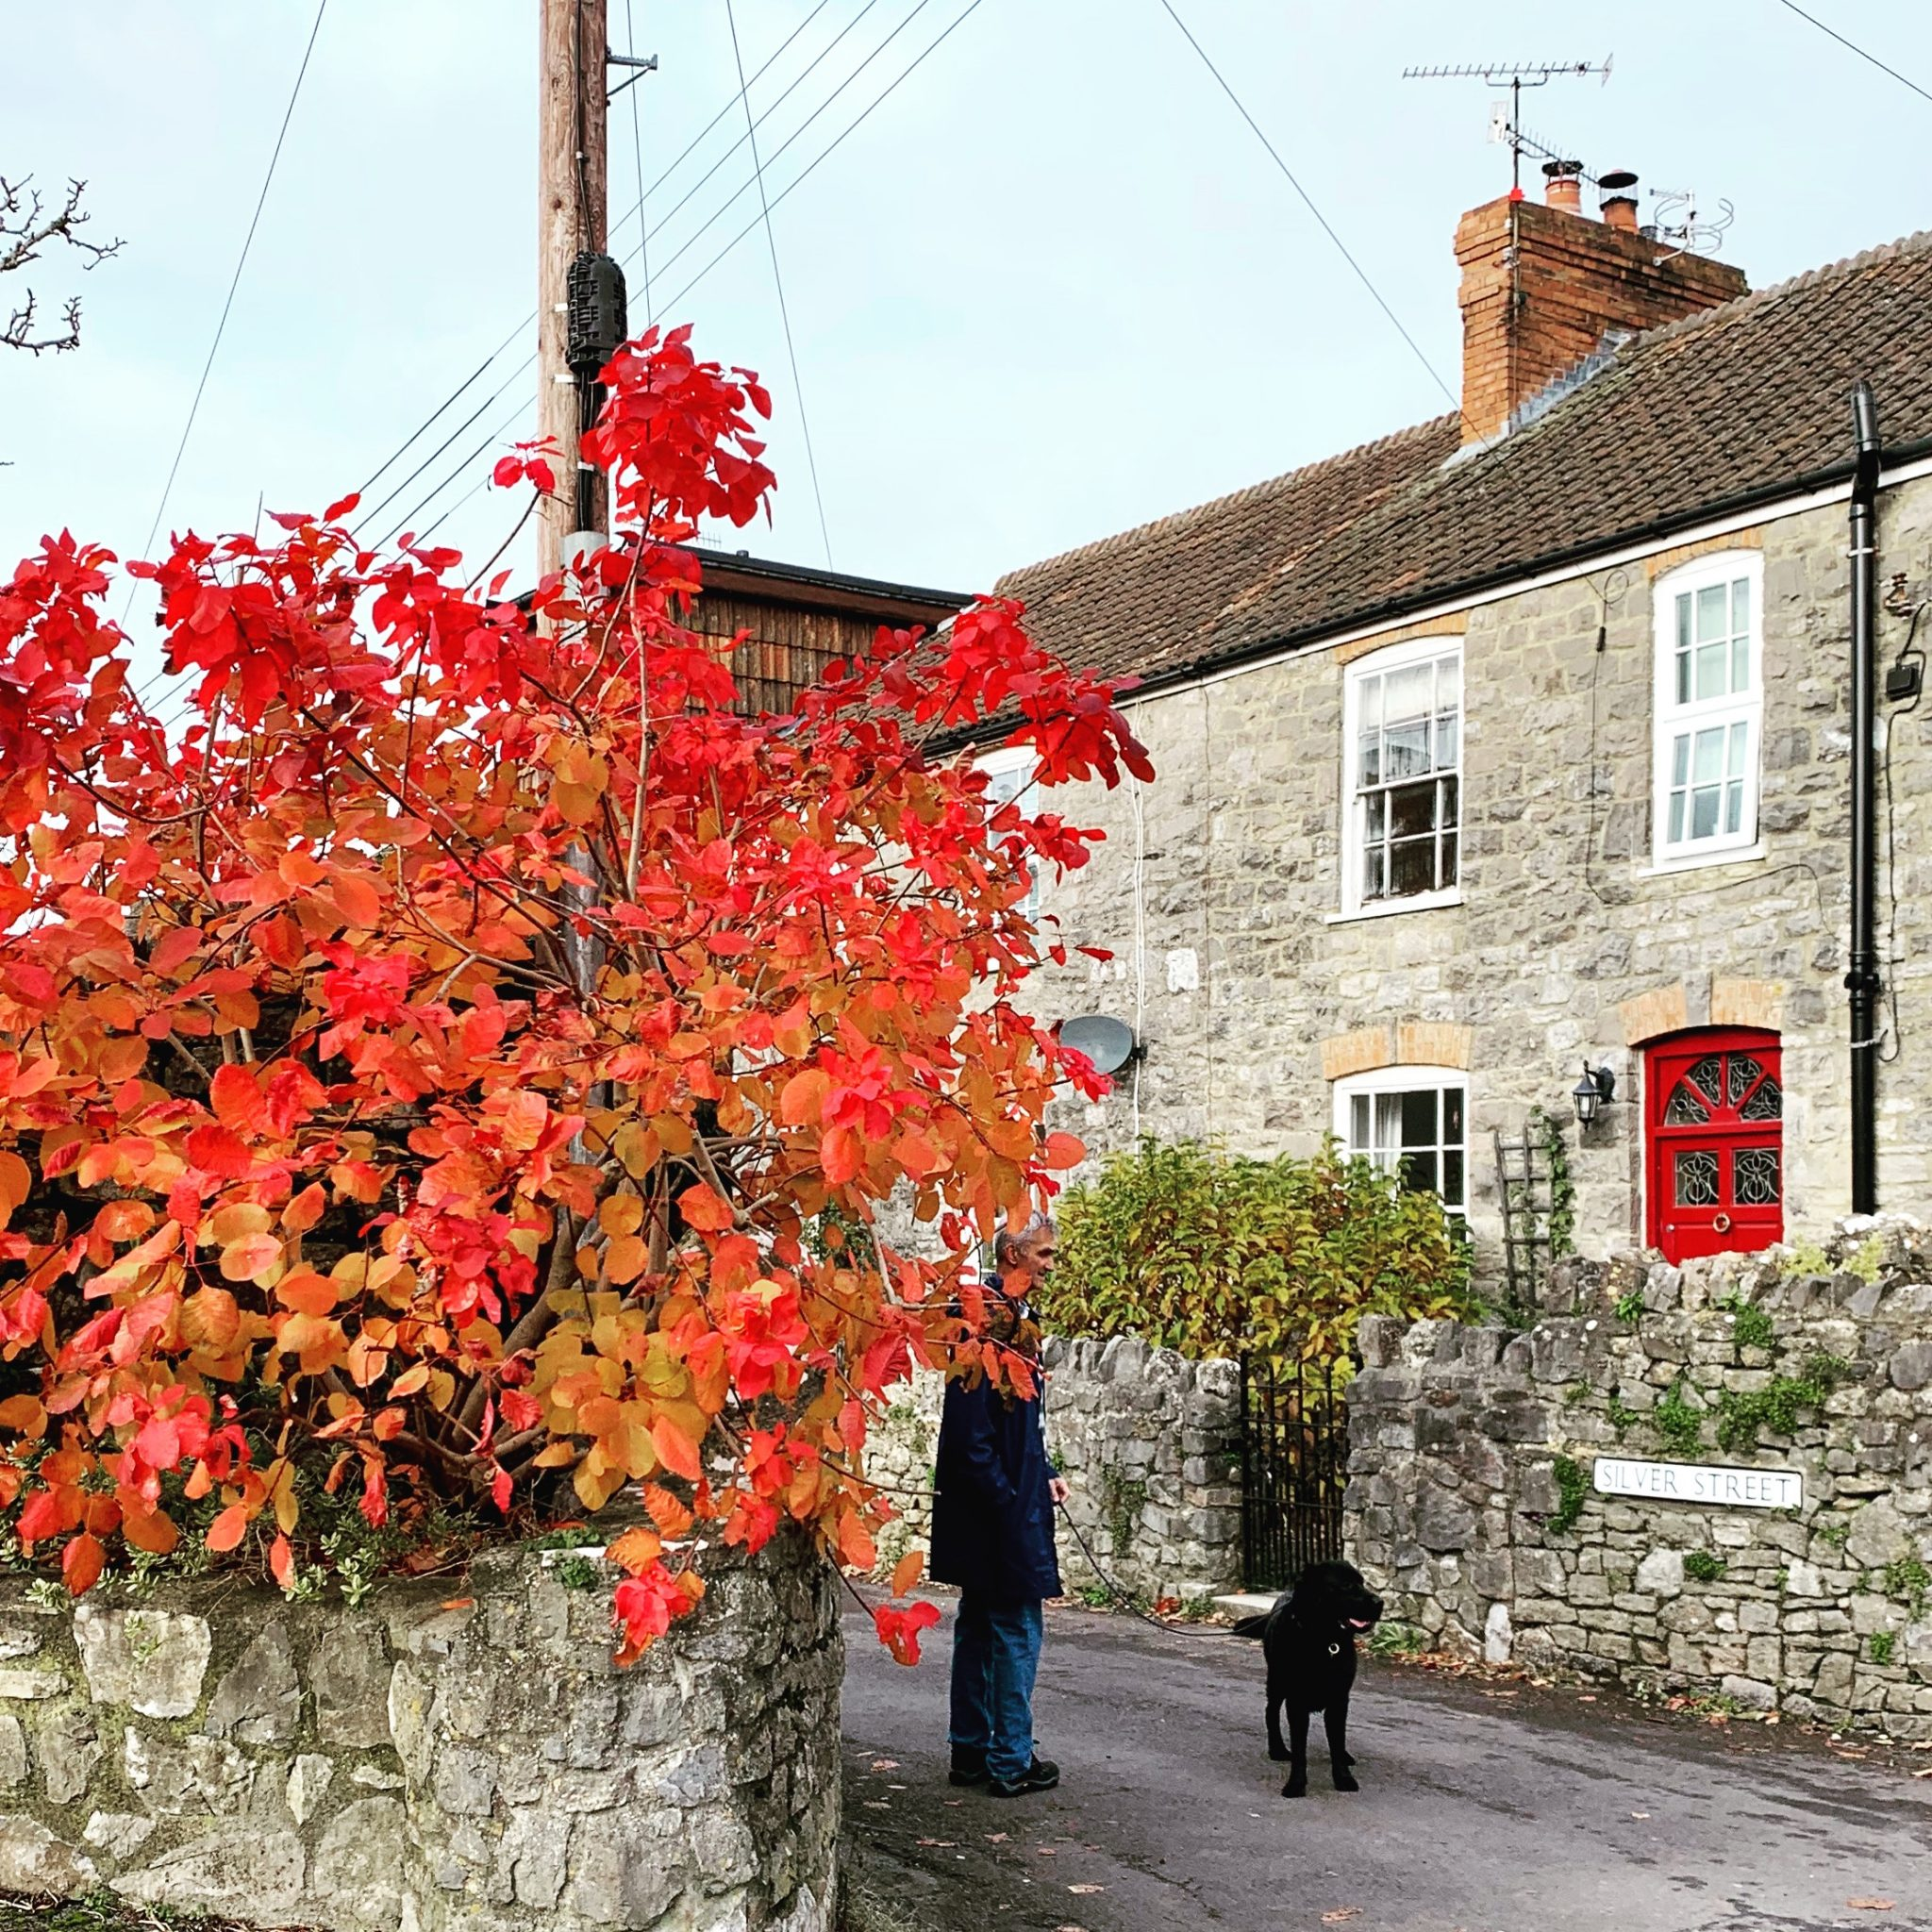 Autumn colour in November